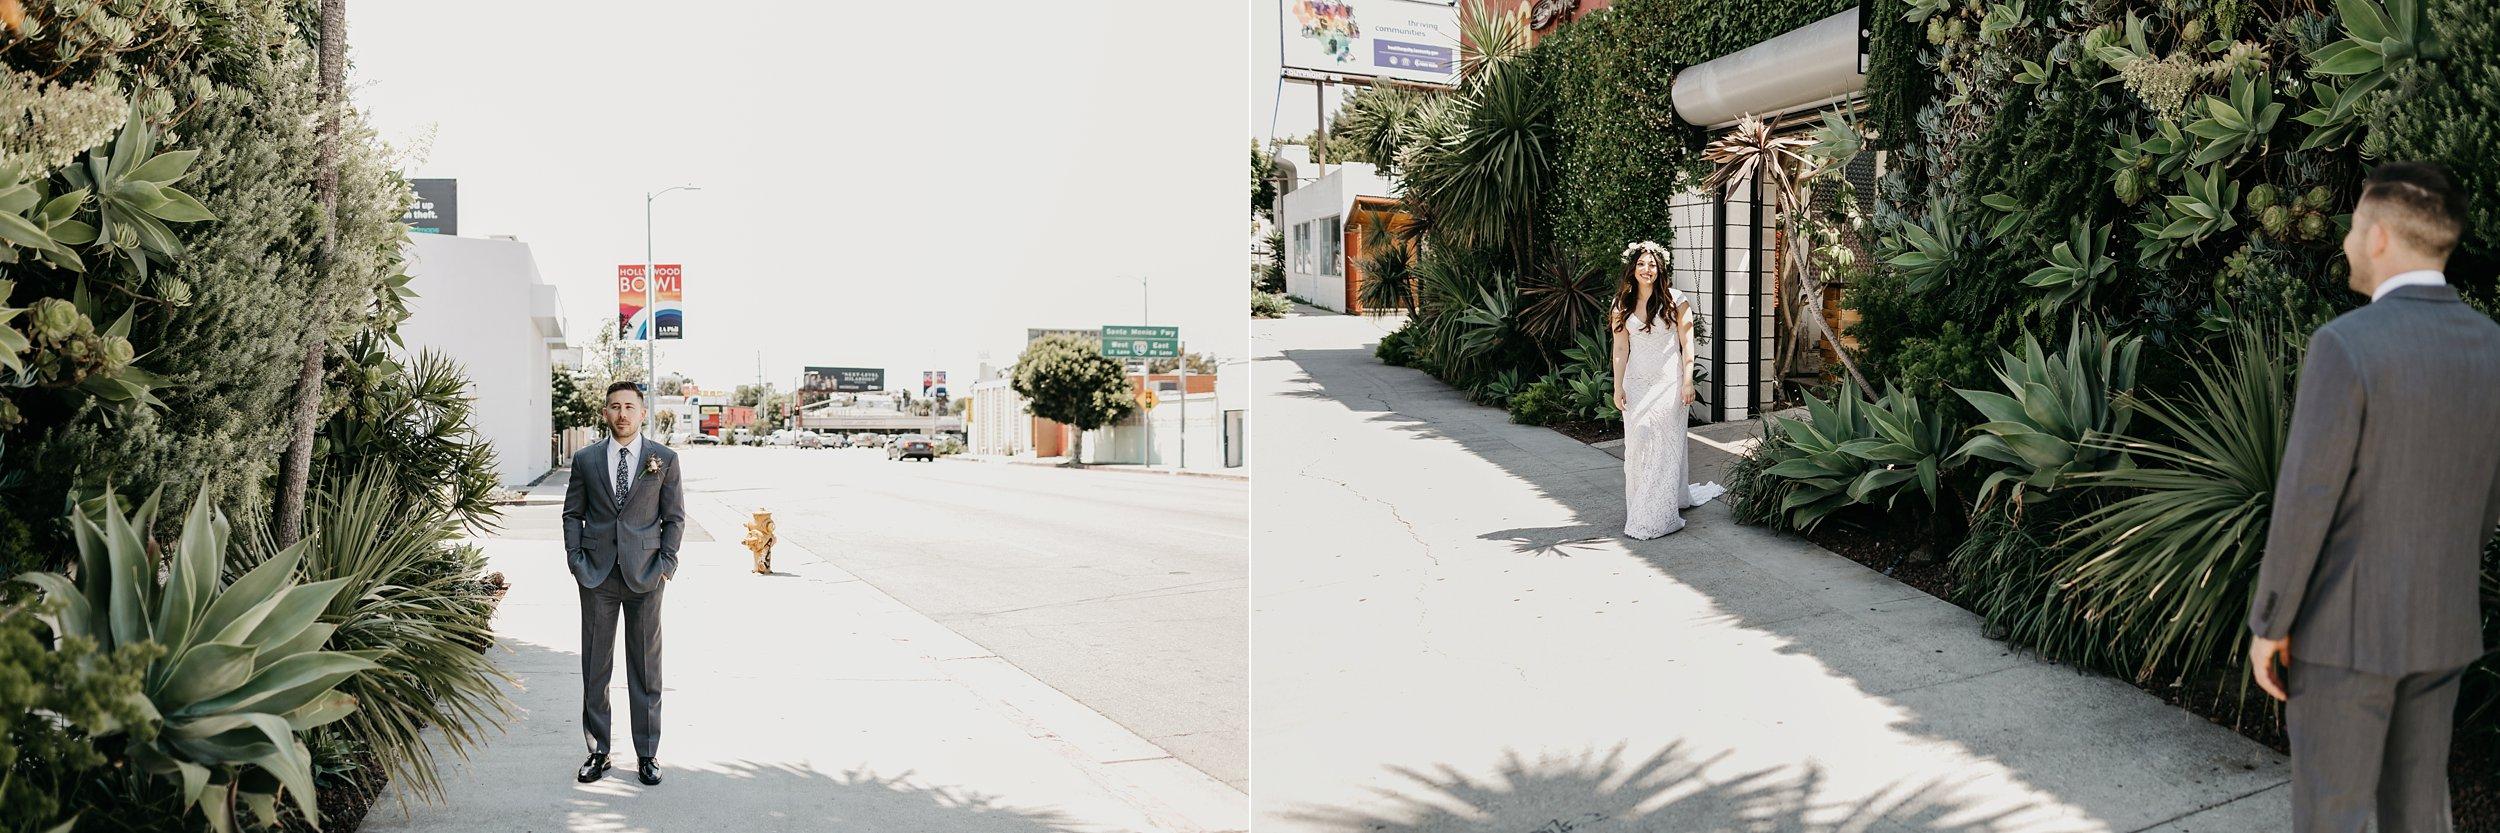 smog shoppe, los angeles, wedding_0007.jpg